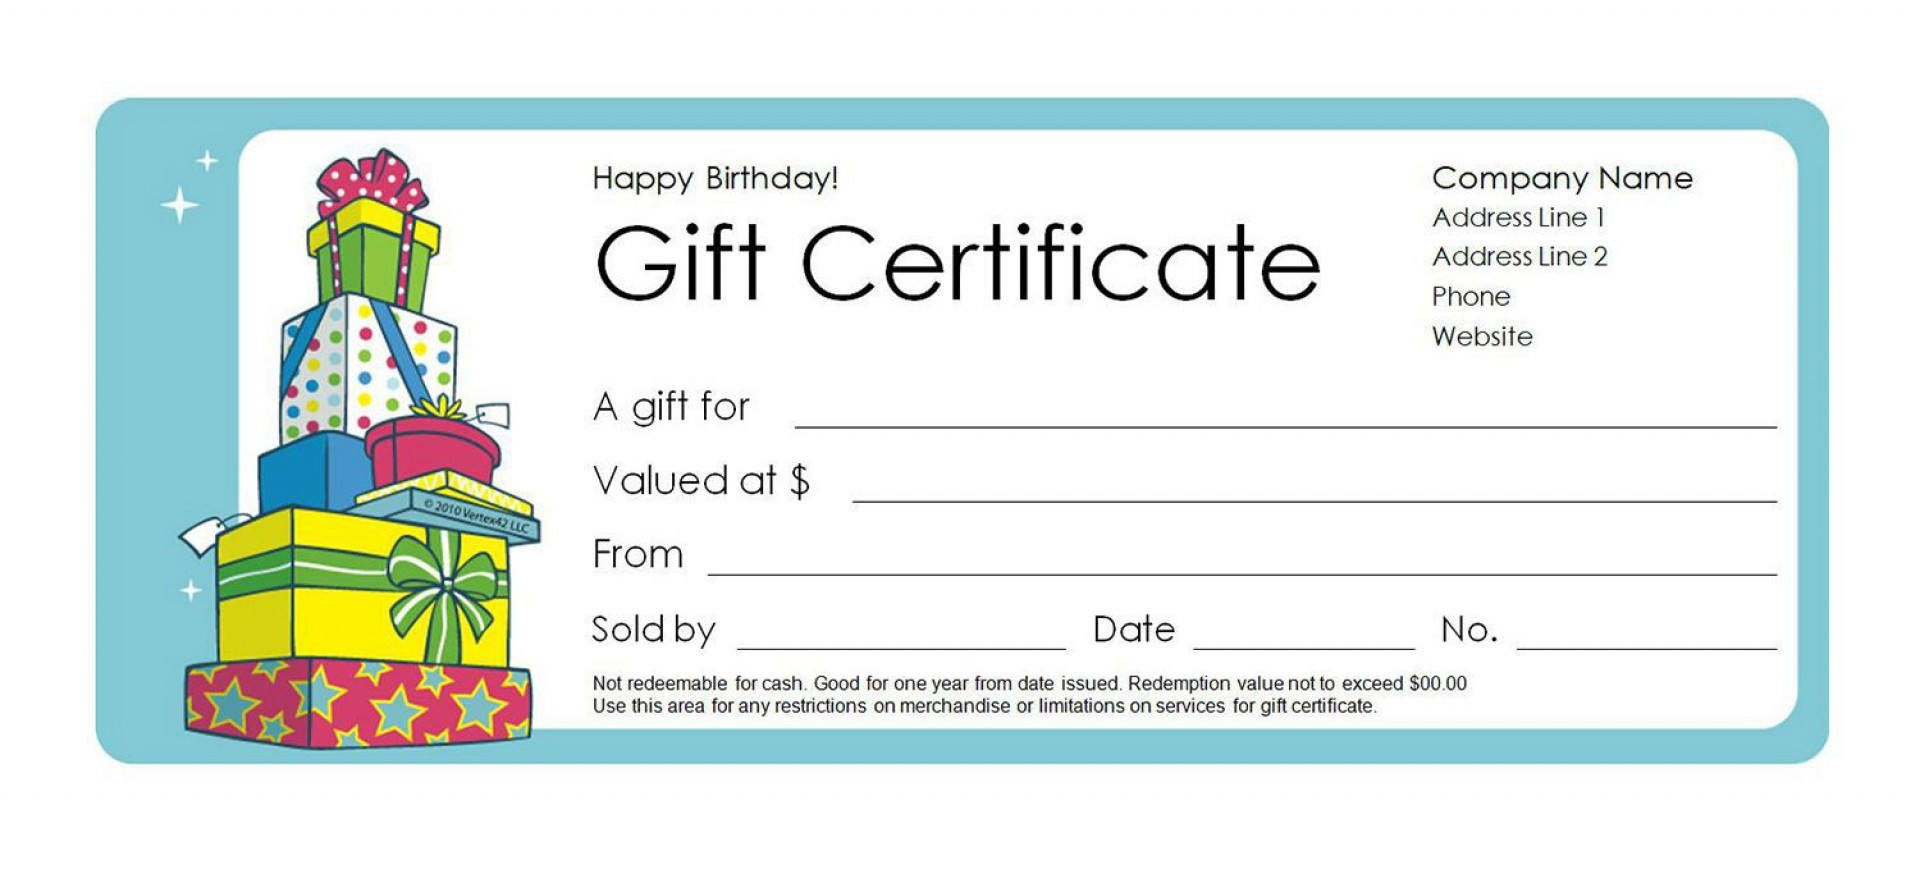 005 Astounding Gift Certificate Template Pdf Design  Massage Christma Printable1920